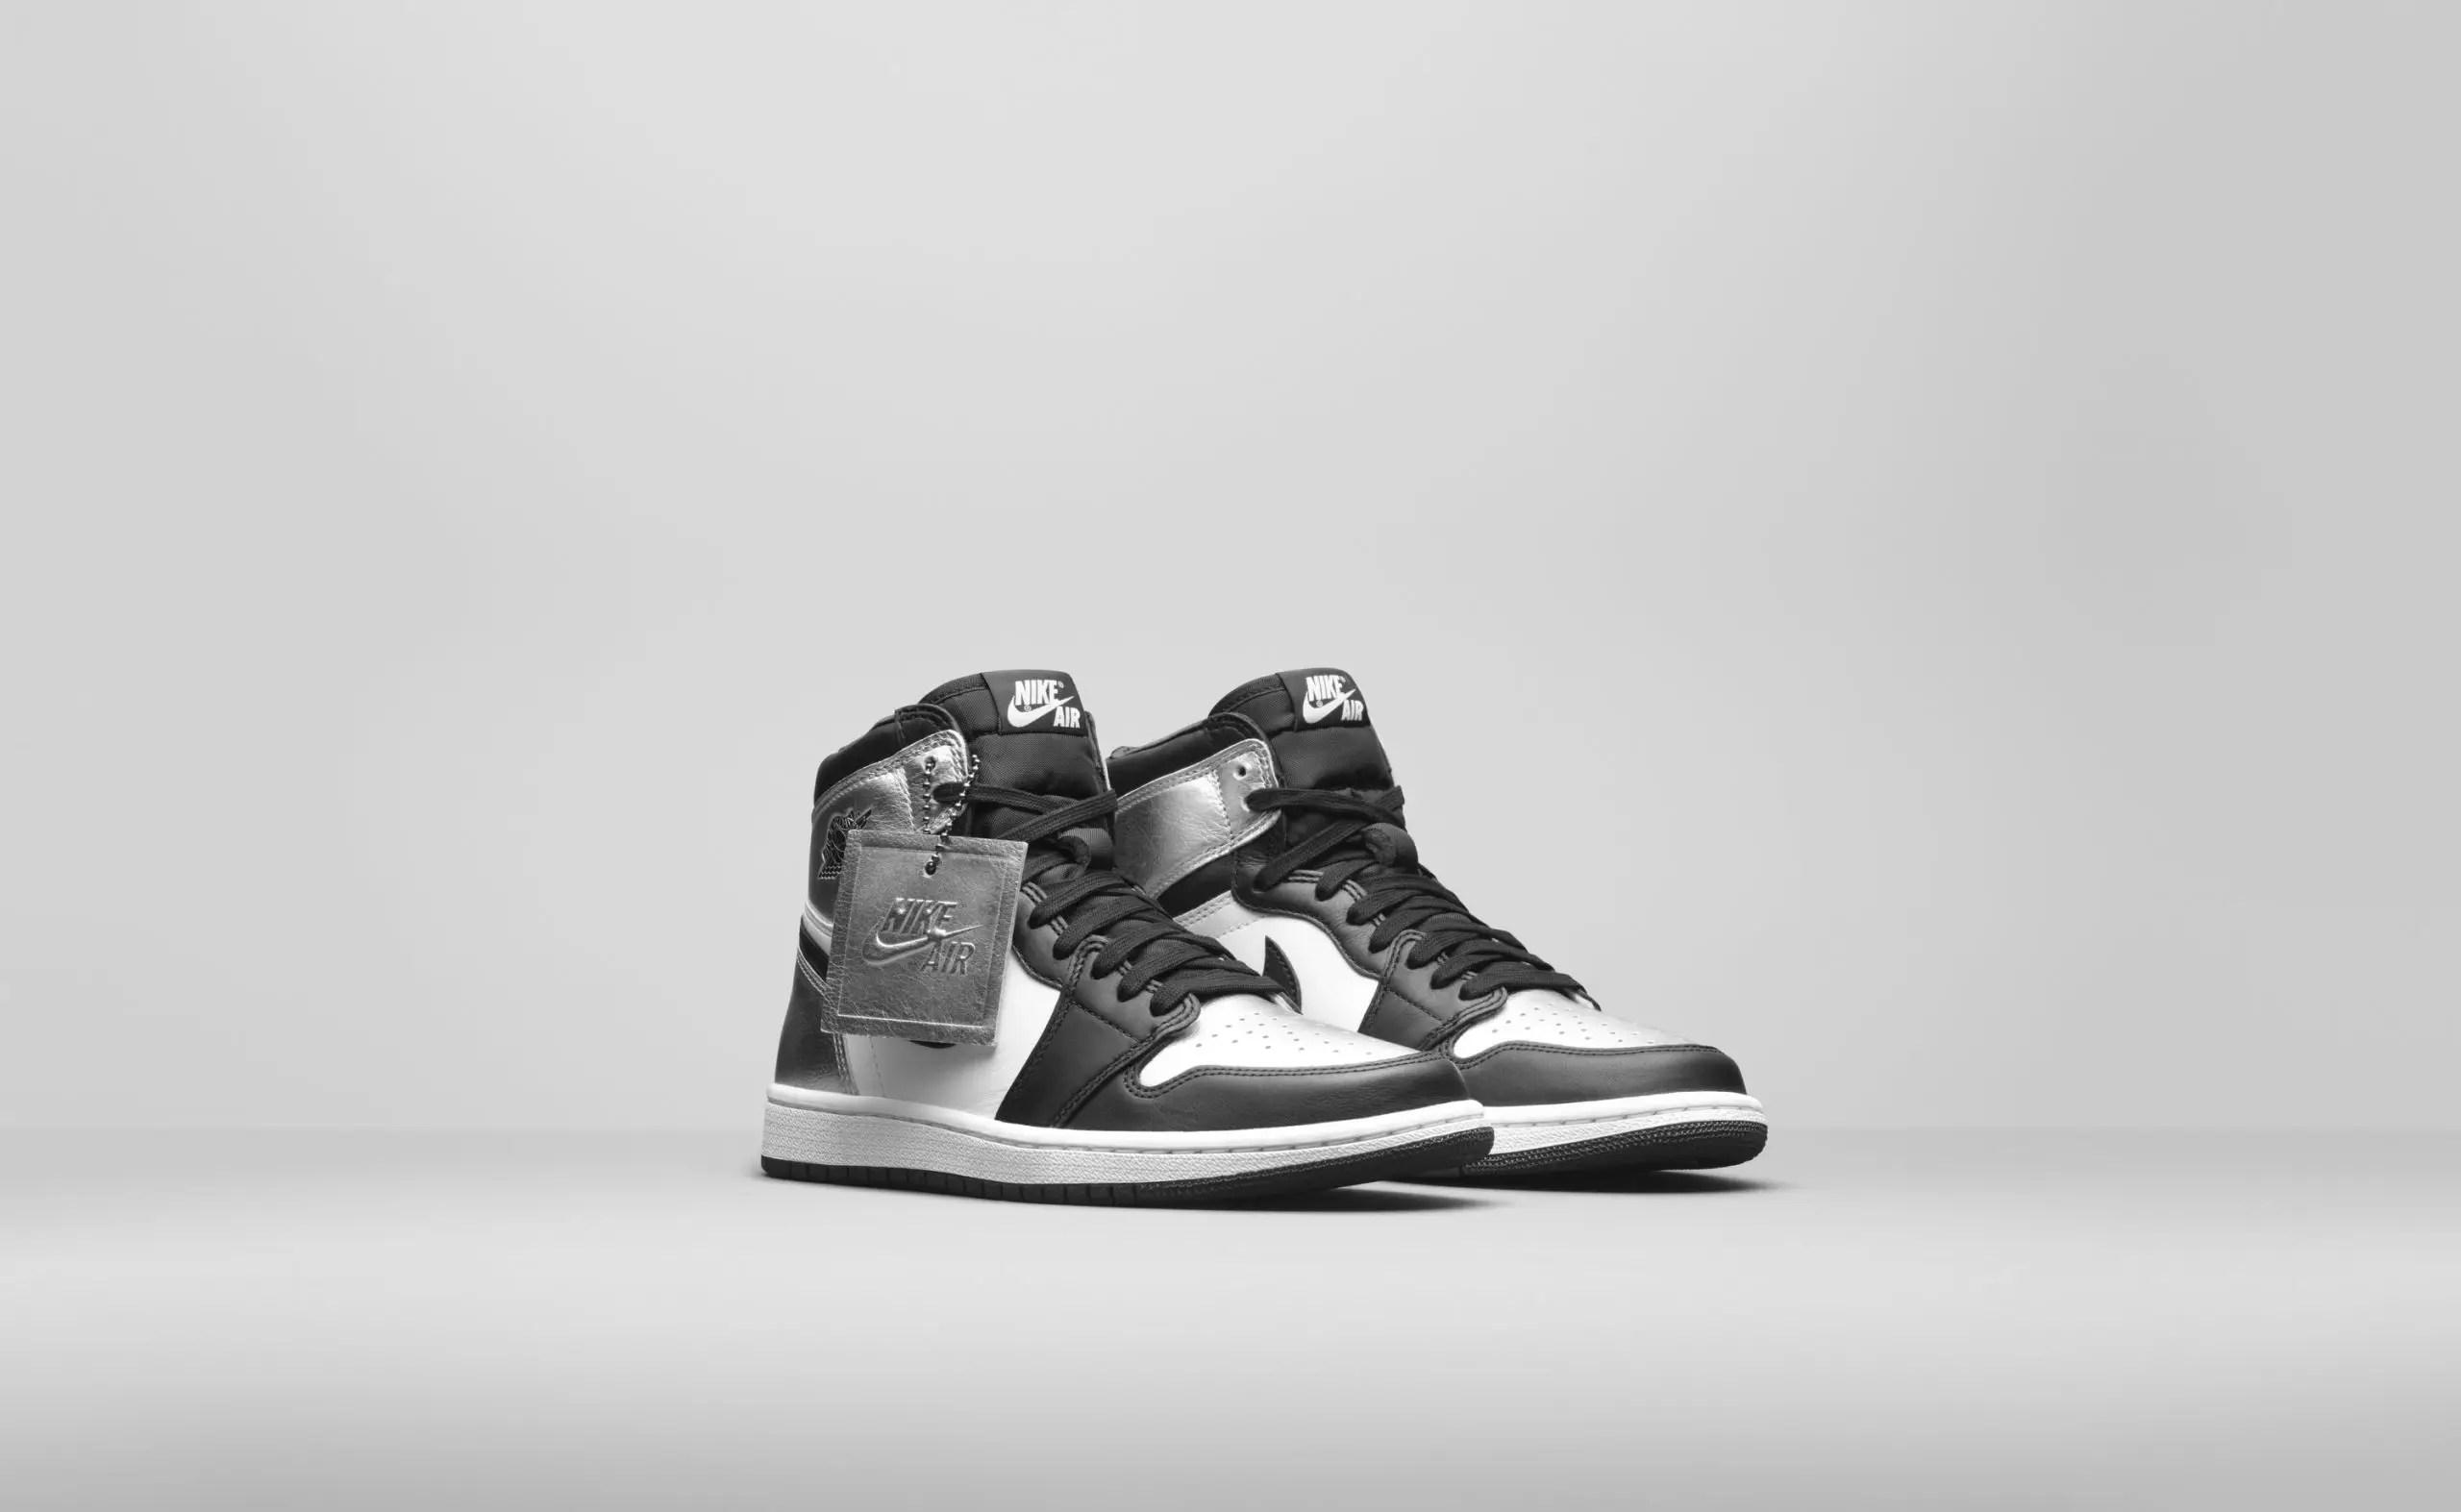 Jordan Brand dévoile sa line-up Spring 2021 Retro